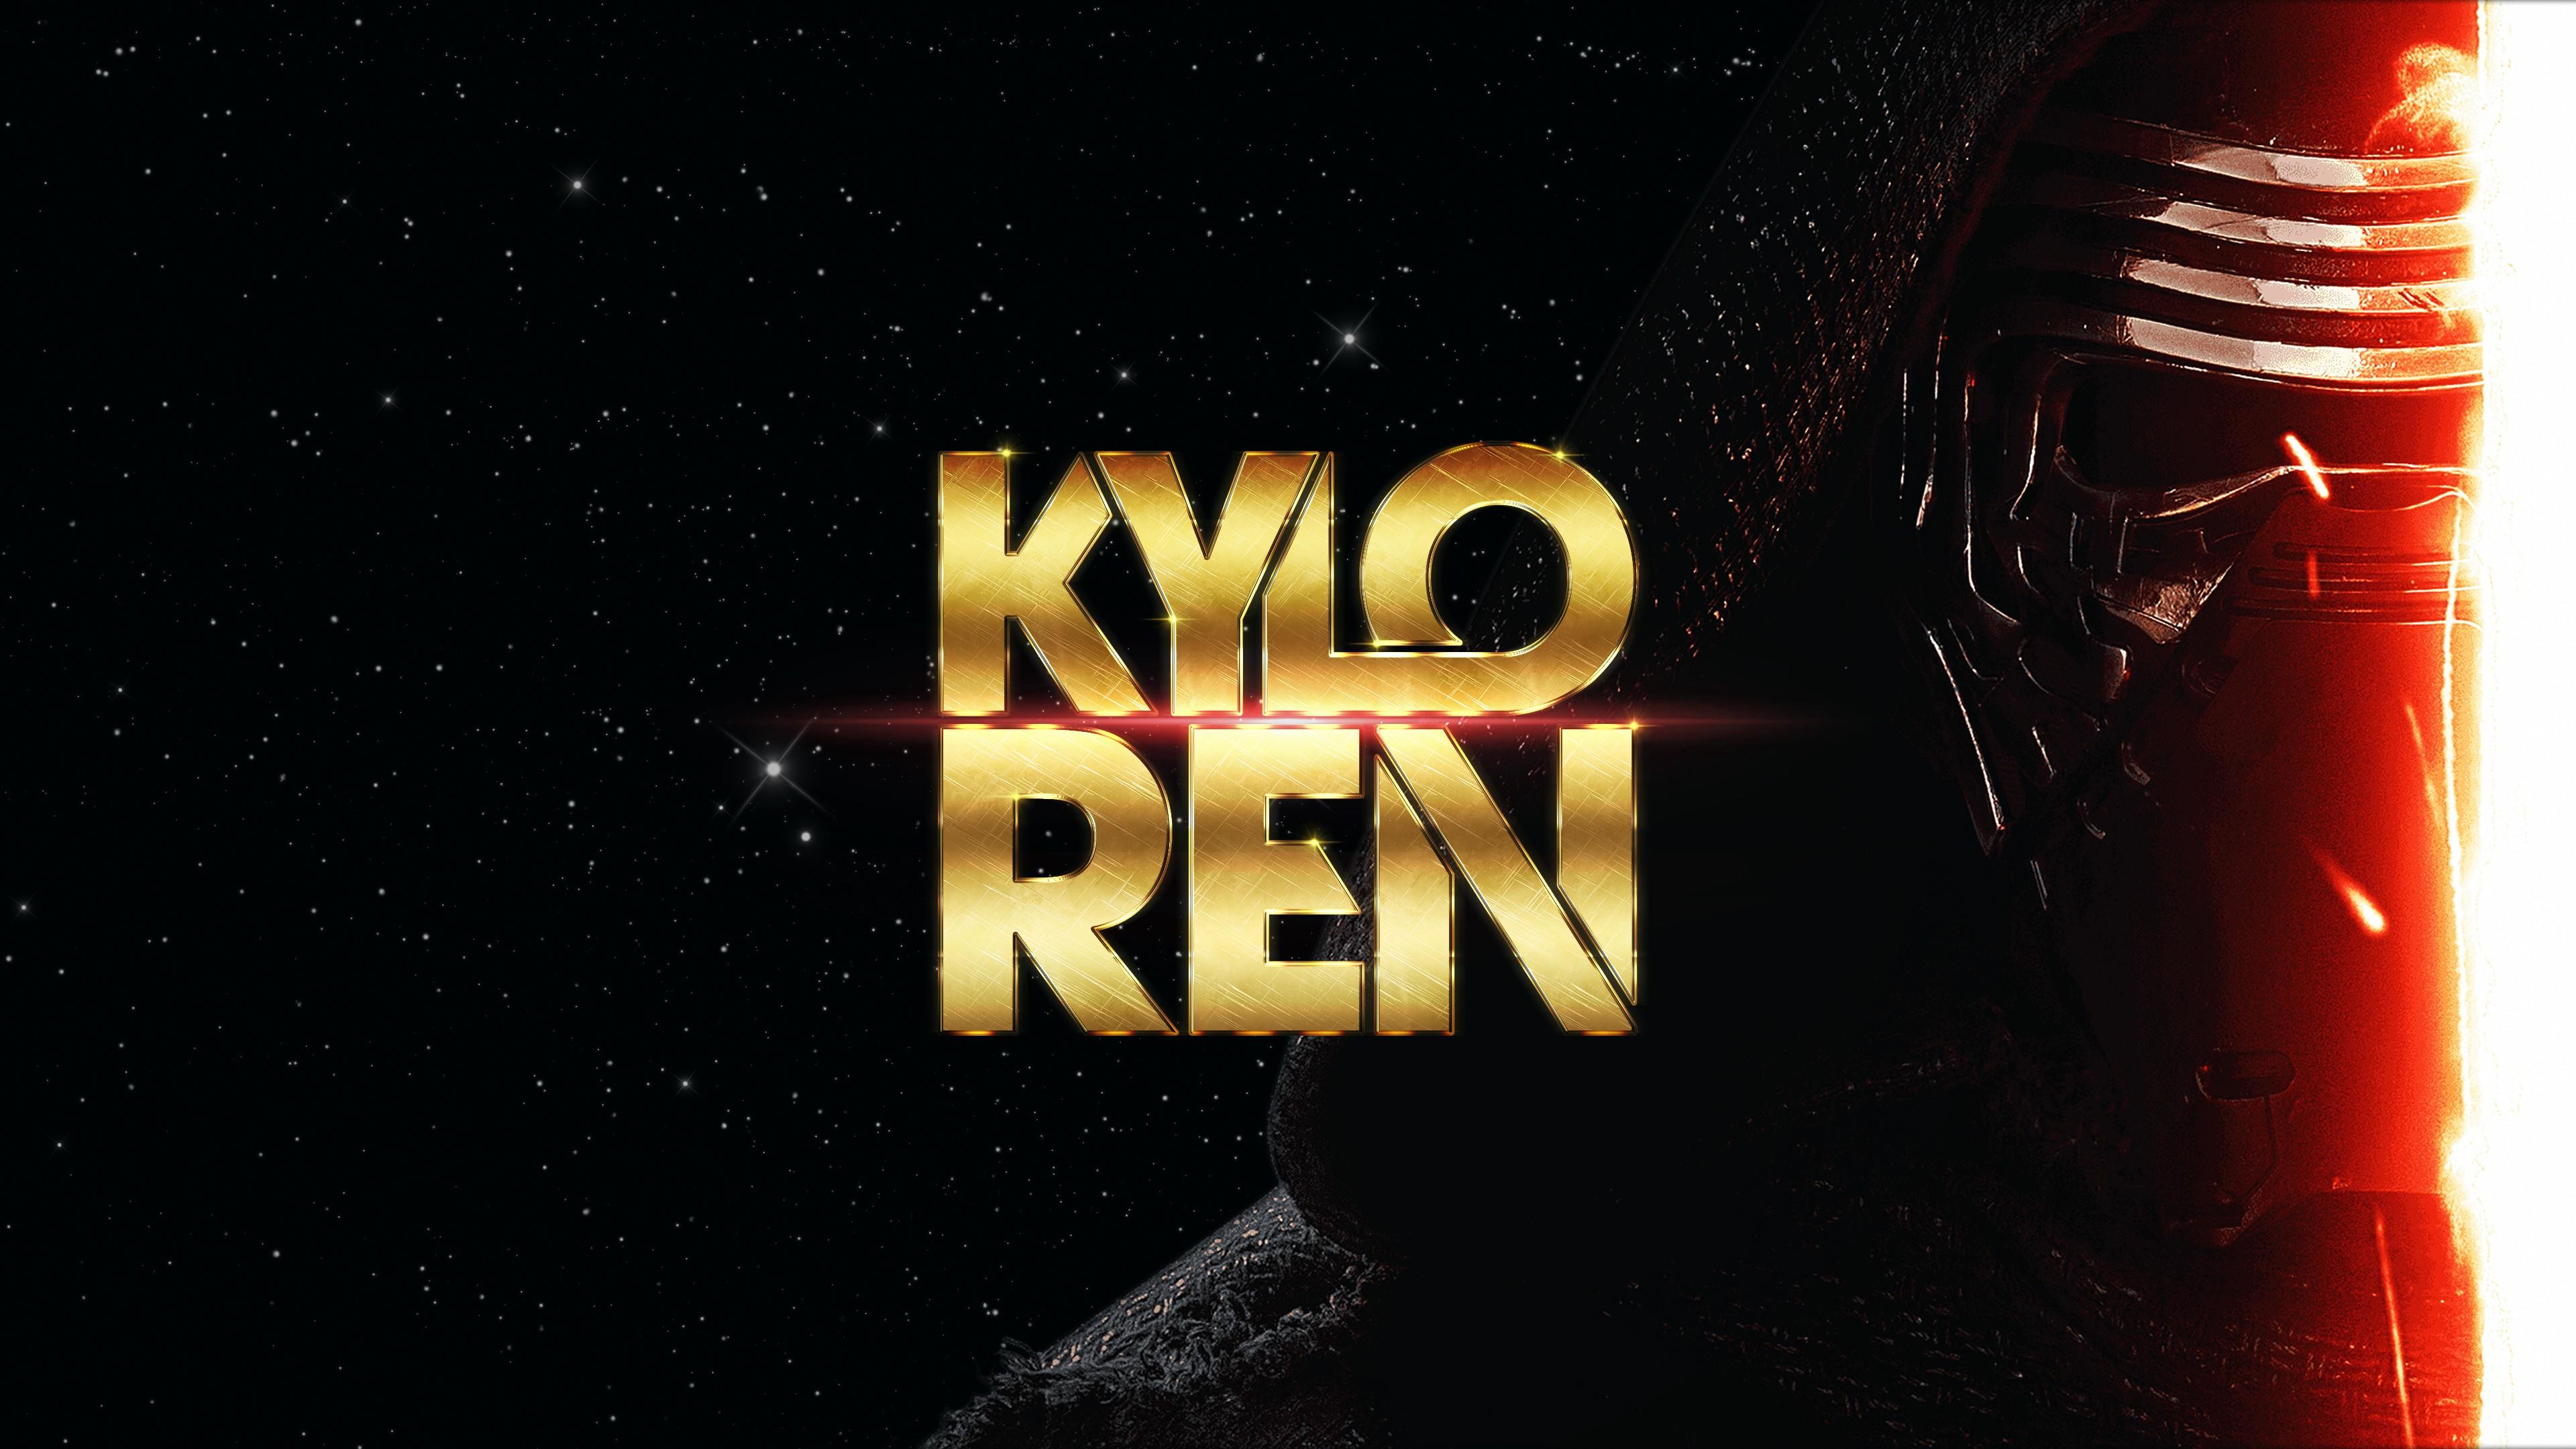 Star Wars text Sith lightsaber Kylo Ren poster brand screenshot 3840x2160 px computer wallpaper font album cover star wars episode vii the force awakens 617621